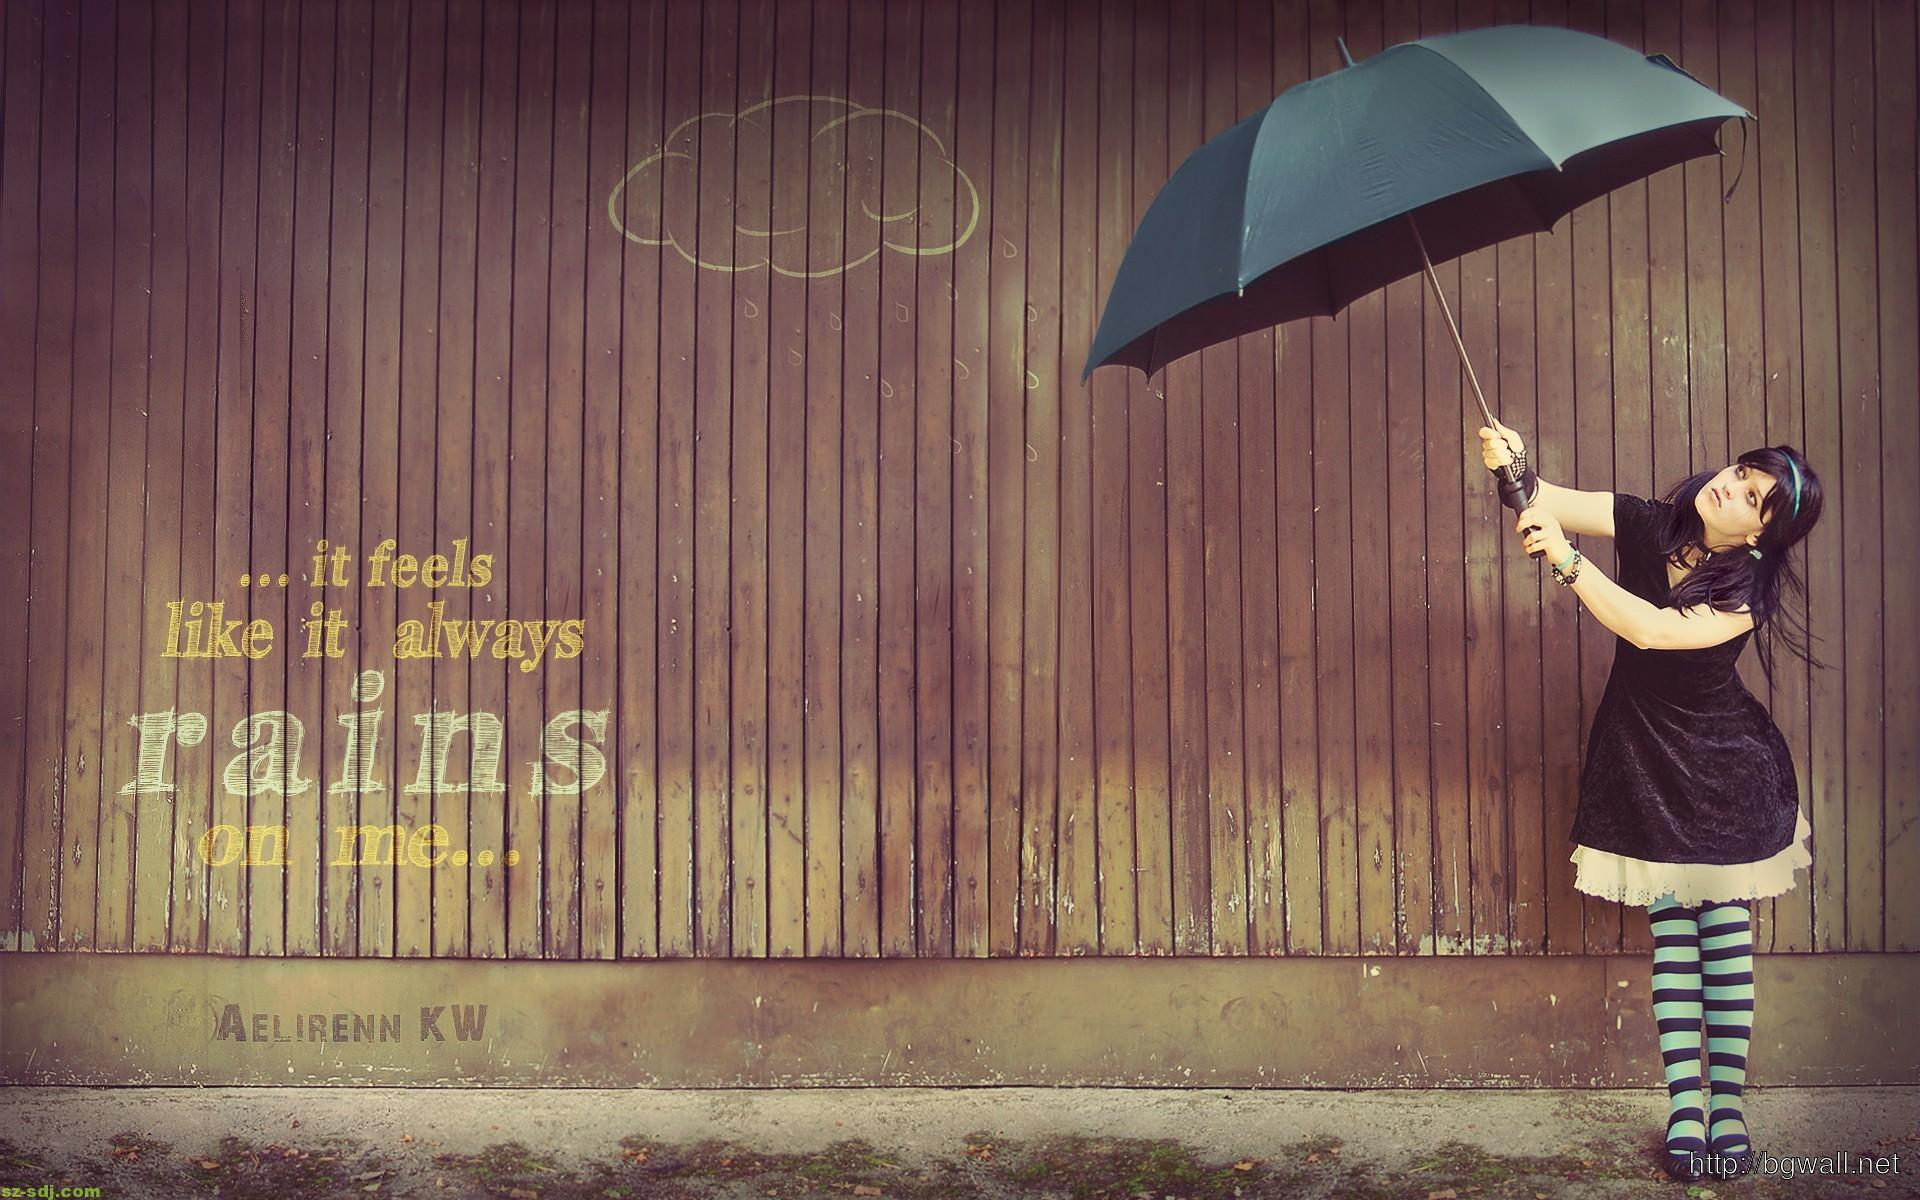 rain quotes wallpapers - photo #25